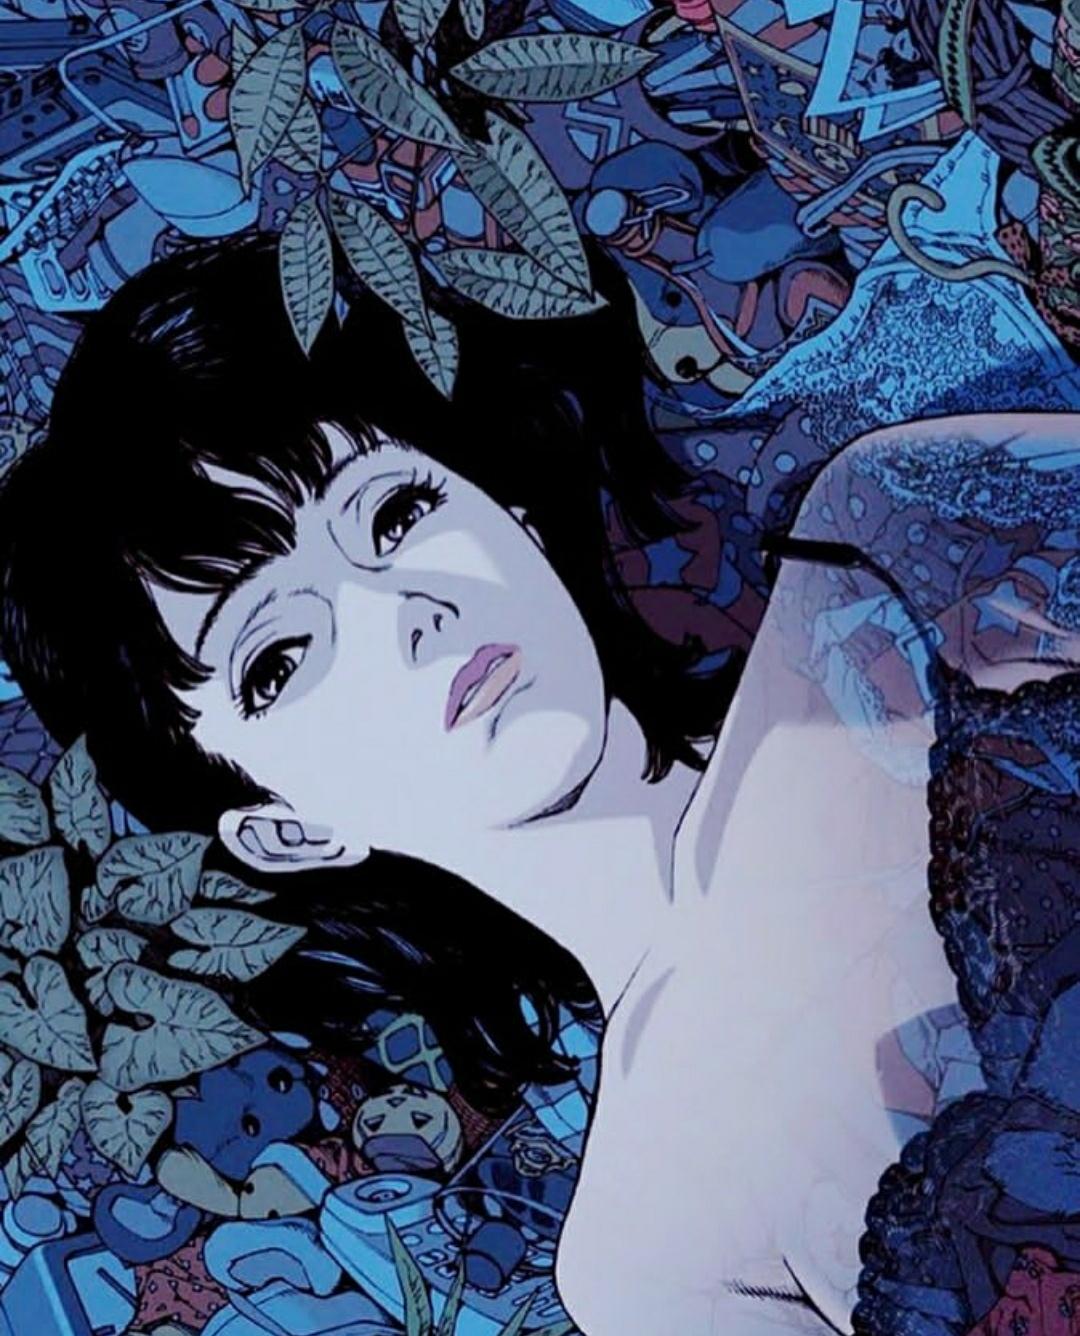 Wallpaper Anime Perfect Blue 1080x1336 Olakase 1818963 Hd Wallpapers Wallhere